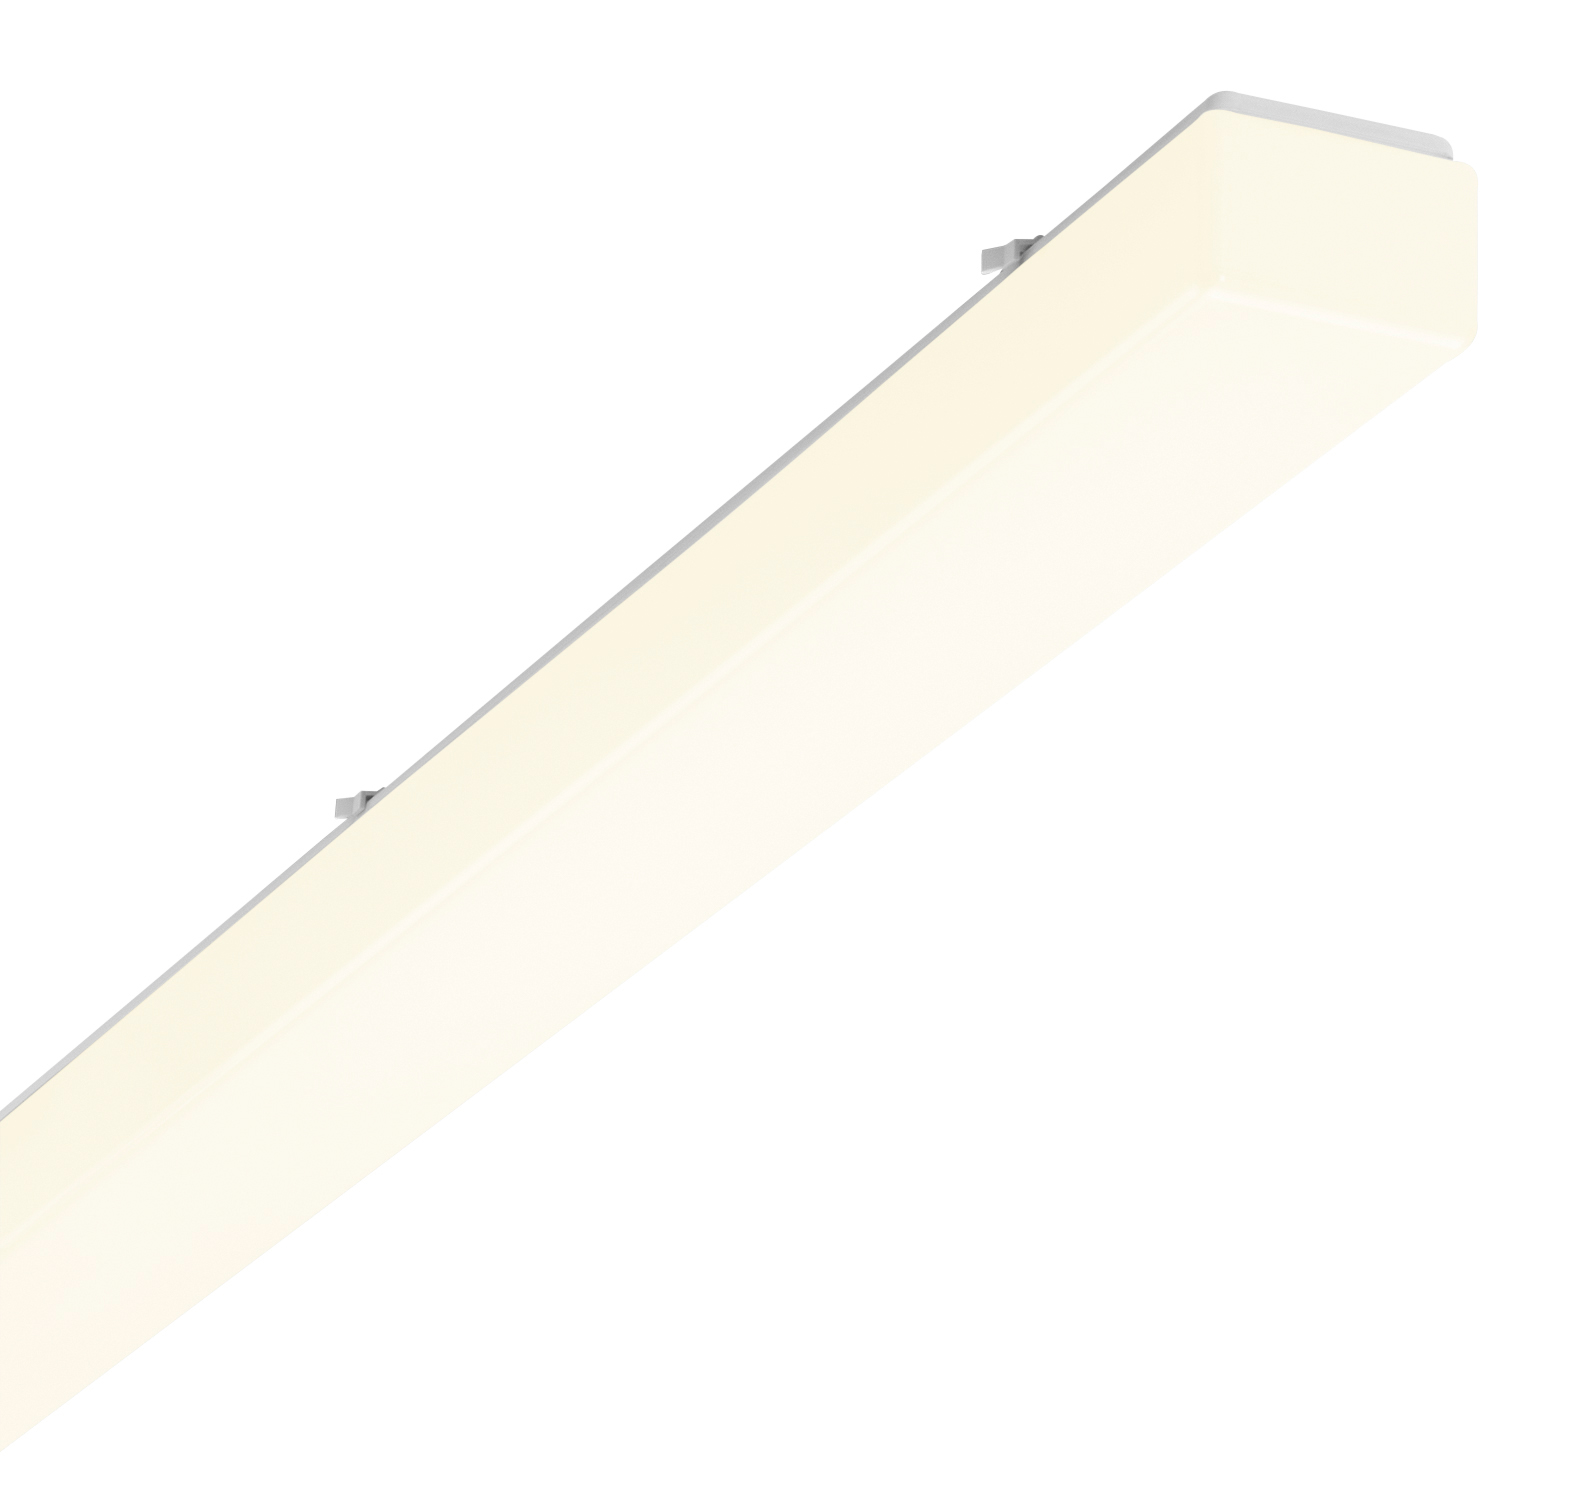 1 Stk AOT-O LED Wannenleuchte, 38W, 4000K, IP50, acryl, opal, Weiß LI70112062